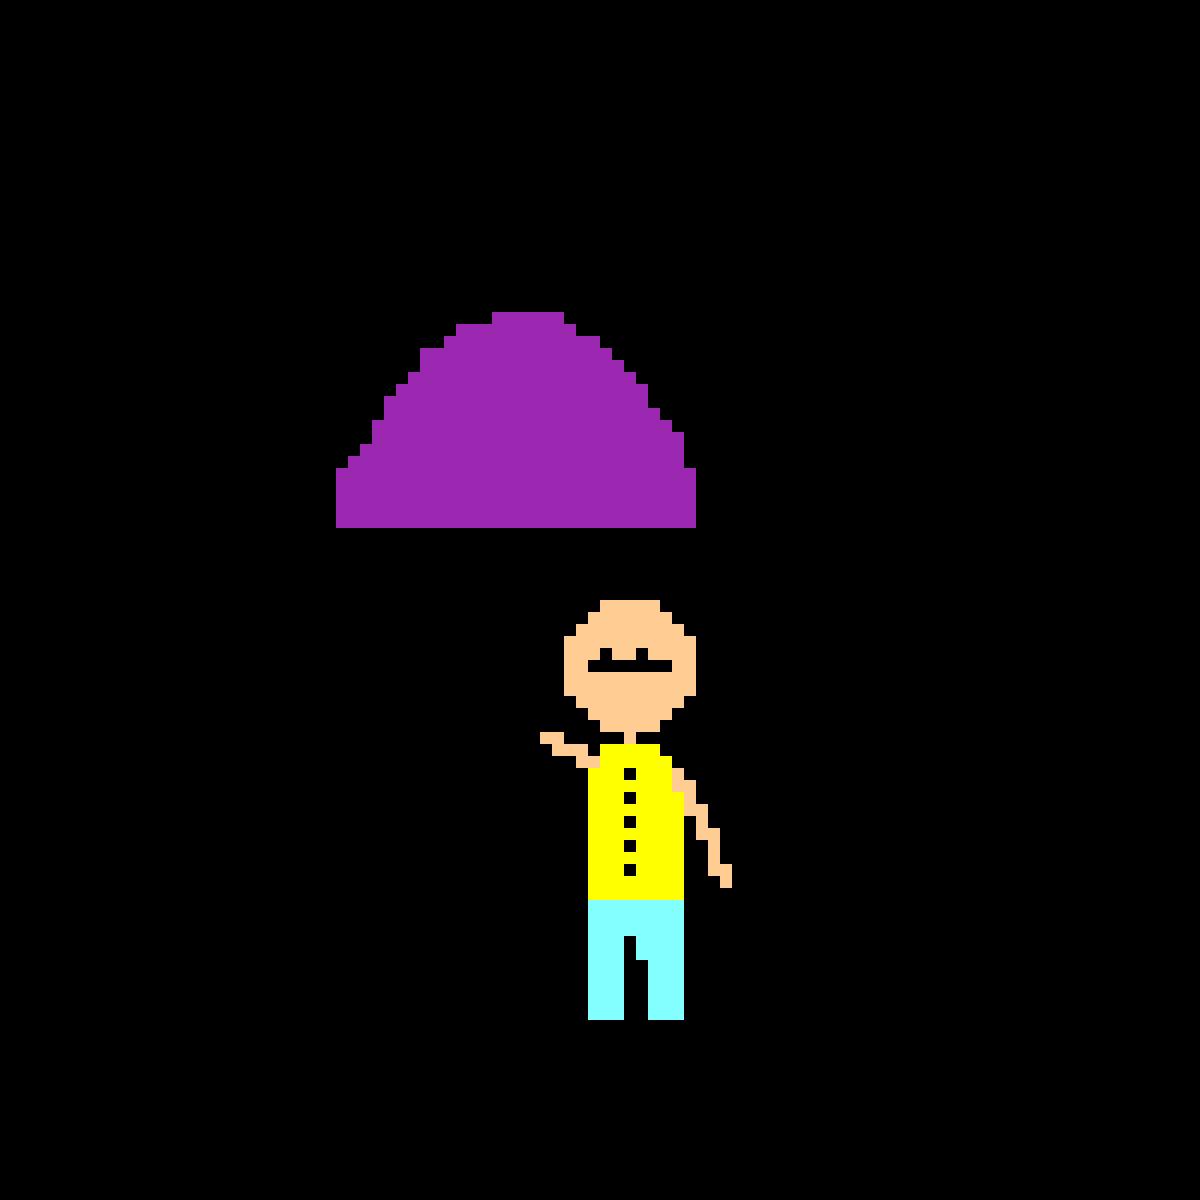 umbrella by Adhdforev22